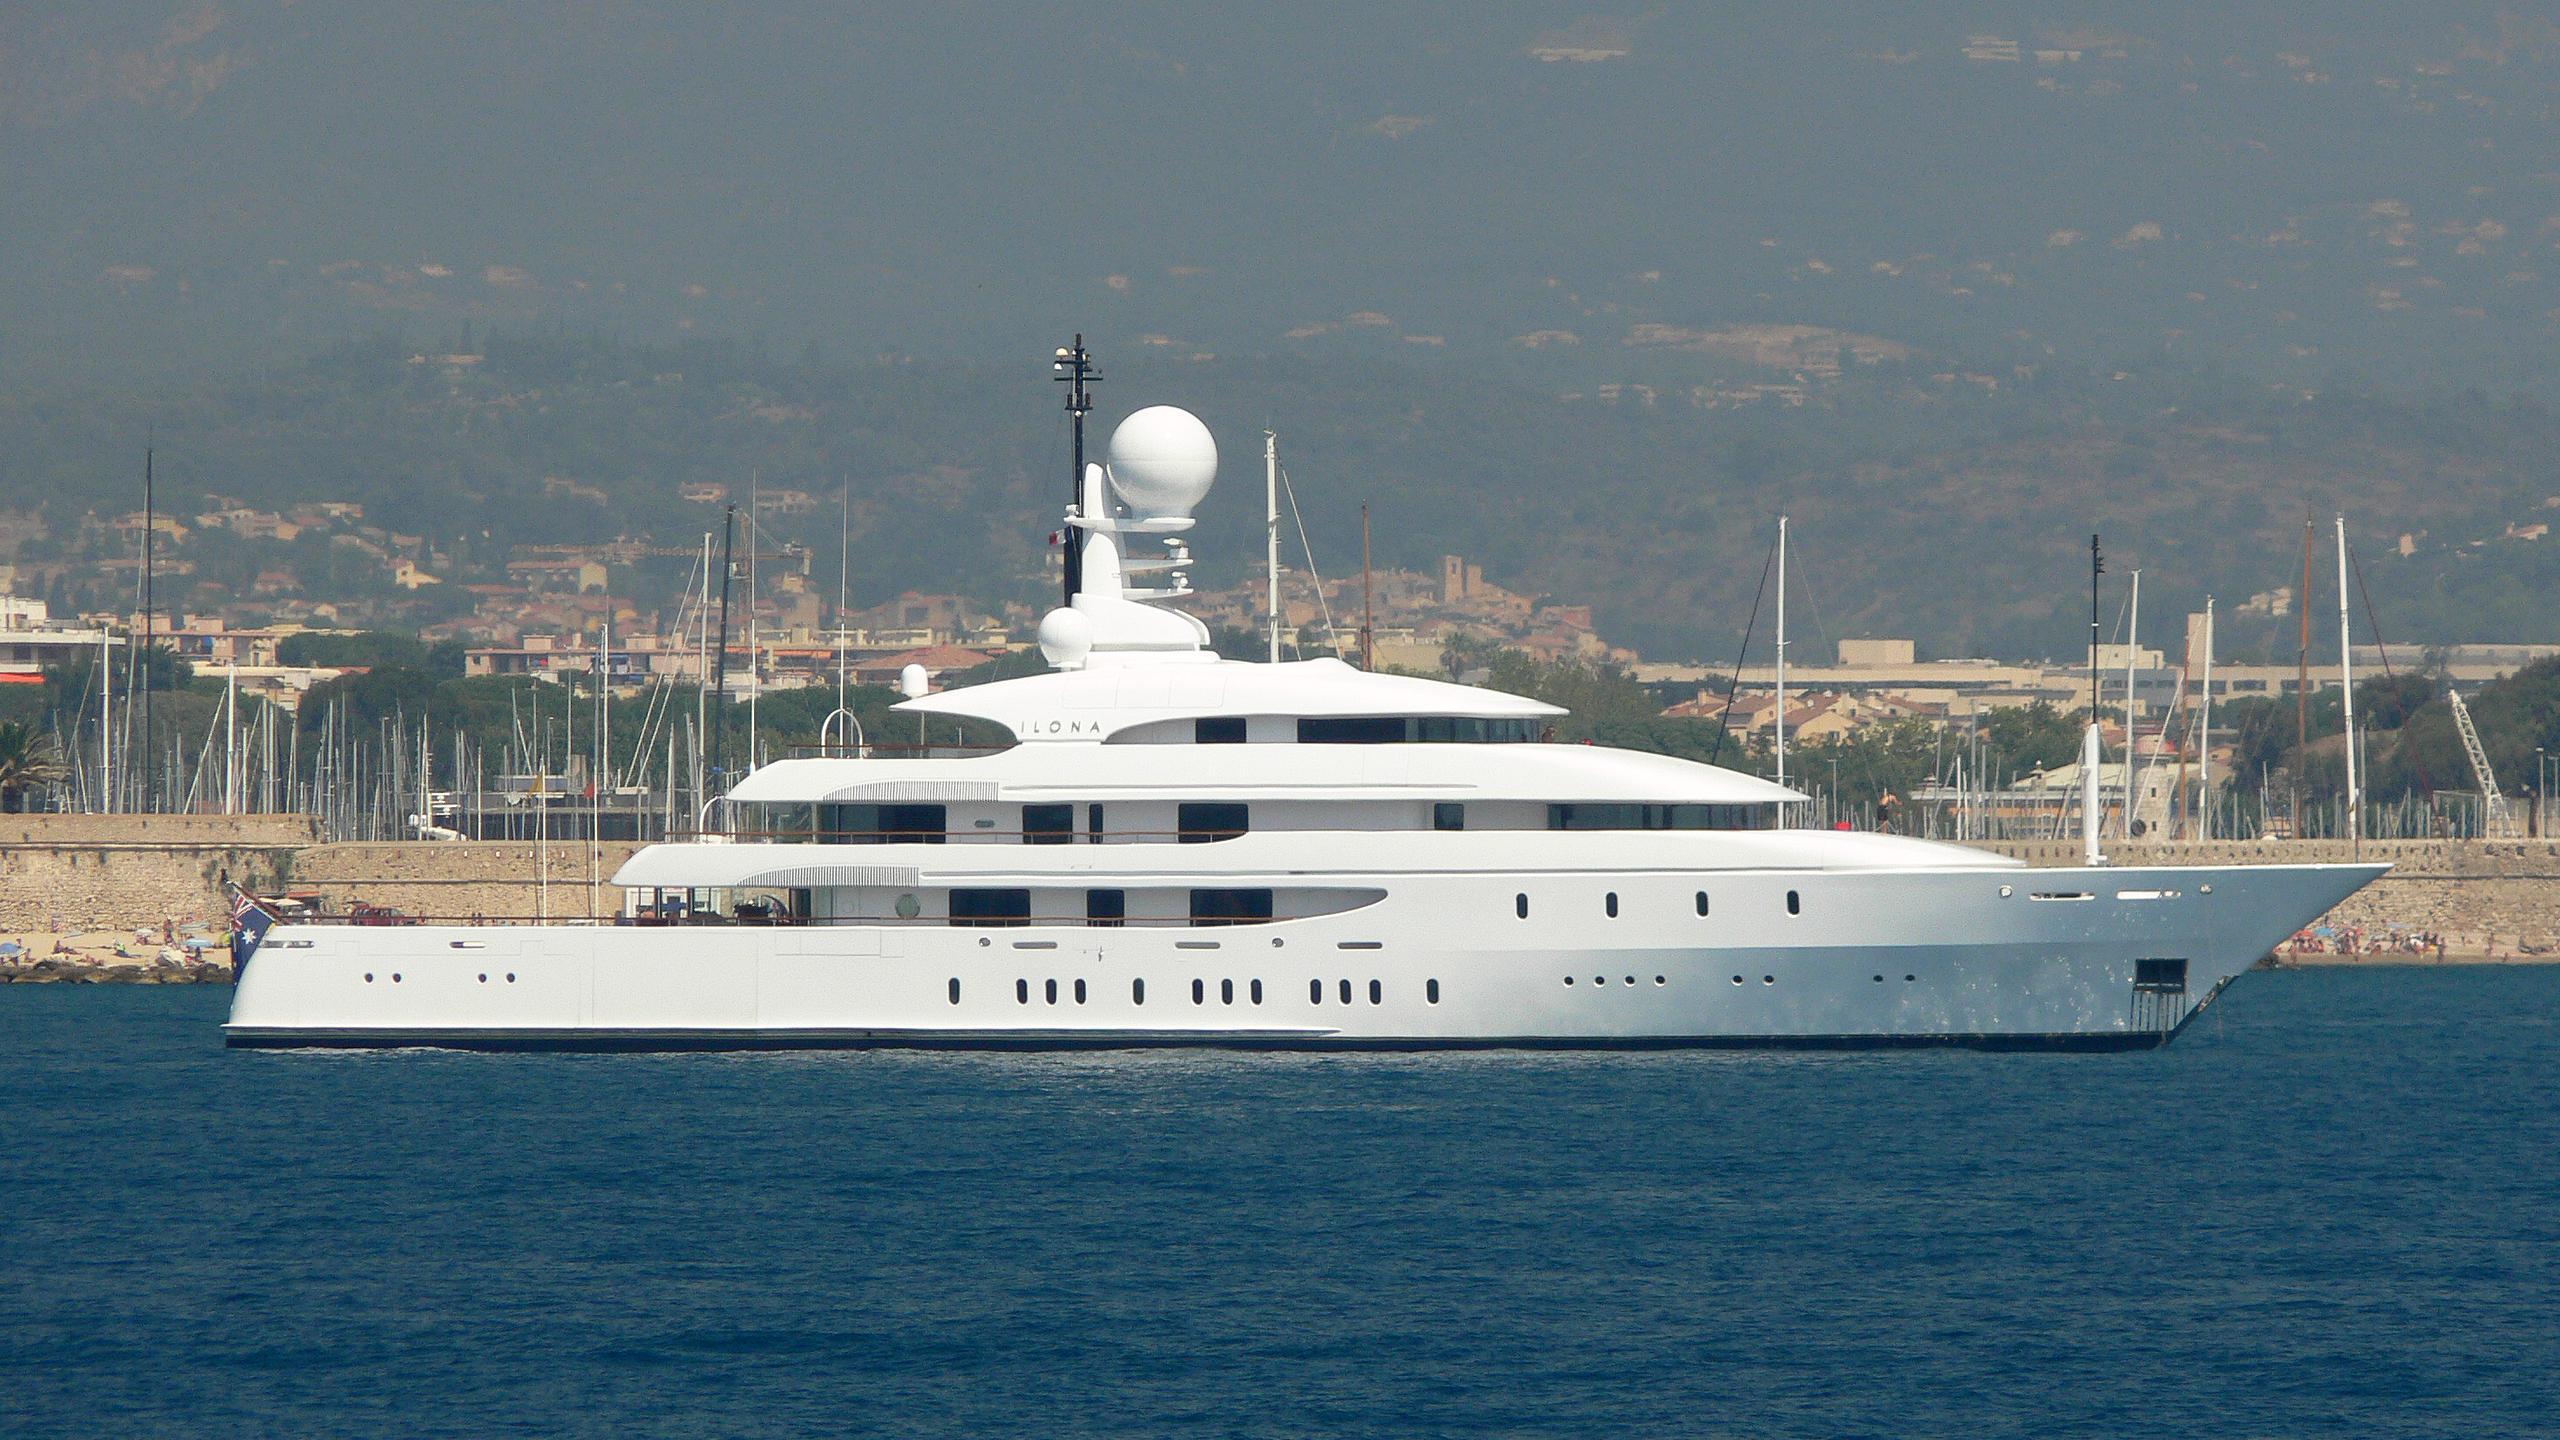 ilona-motor-yacht-amels-2003-74m-profile-before-refit